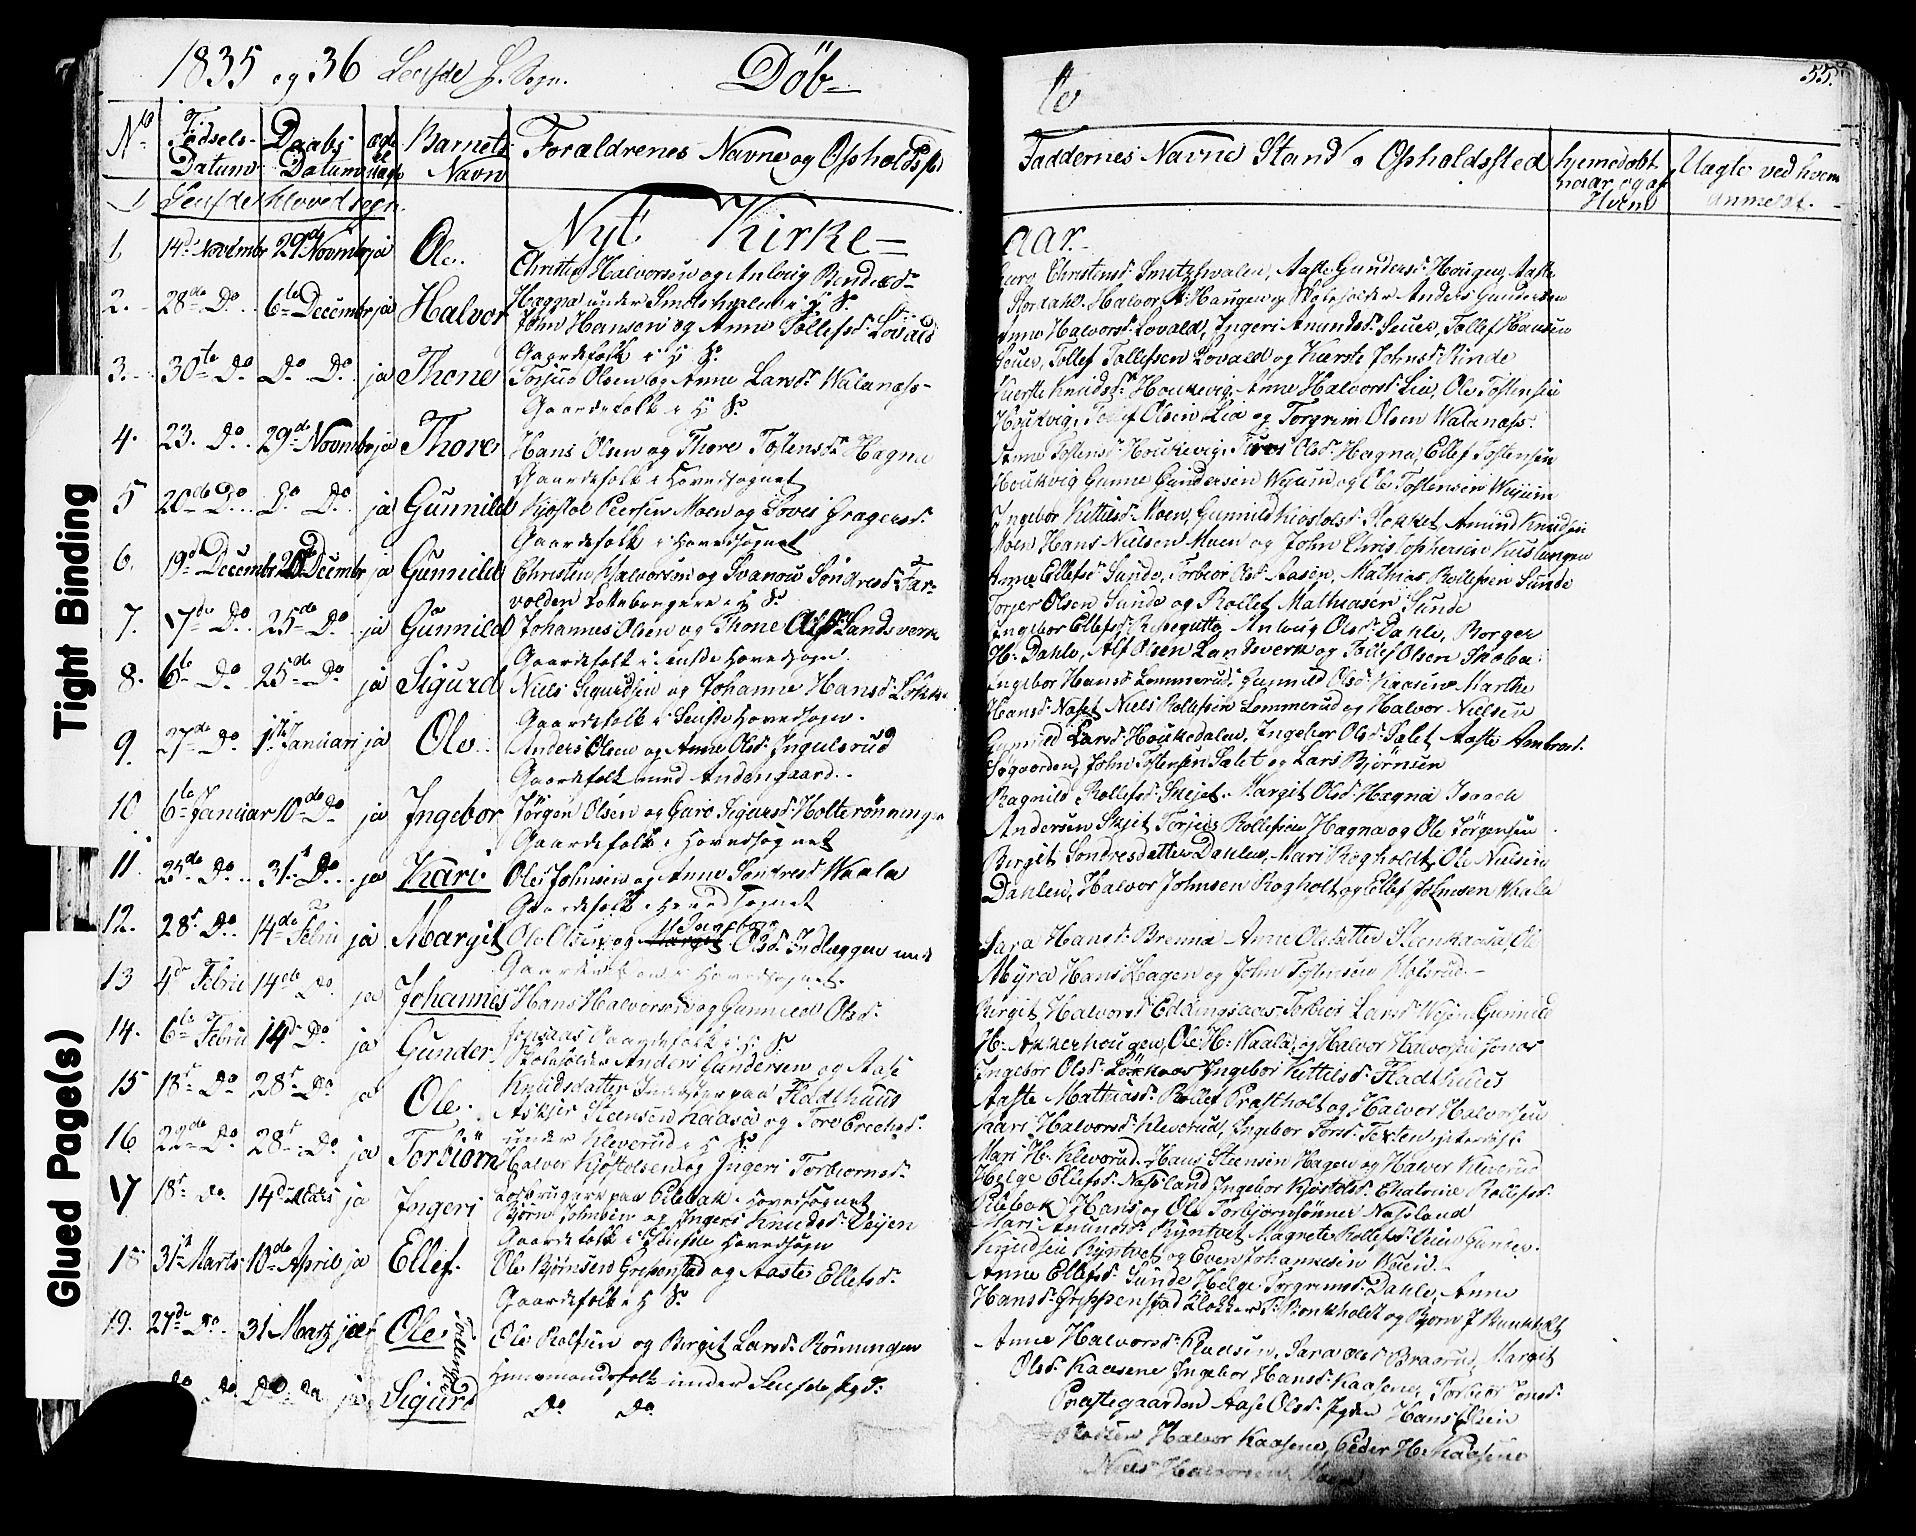 SAKO, Sauherad kirkebøker, F/Fa/L0006: Ministerialbok nr. I 6, 1827-1850, s. 55